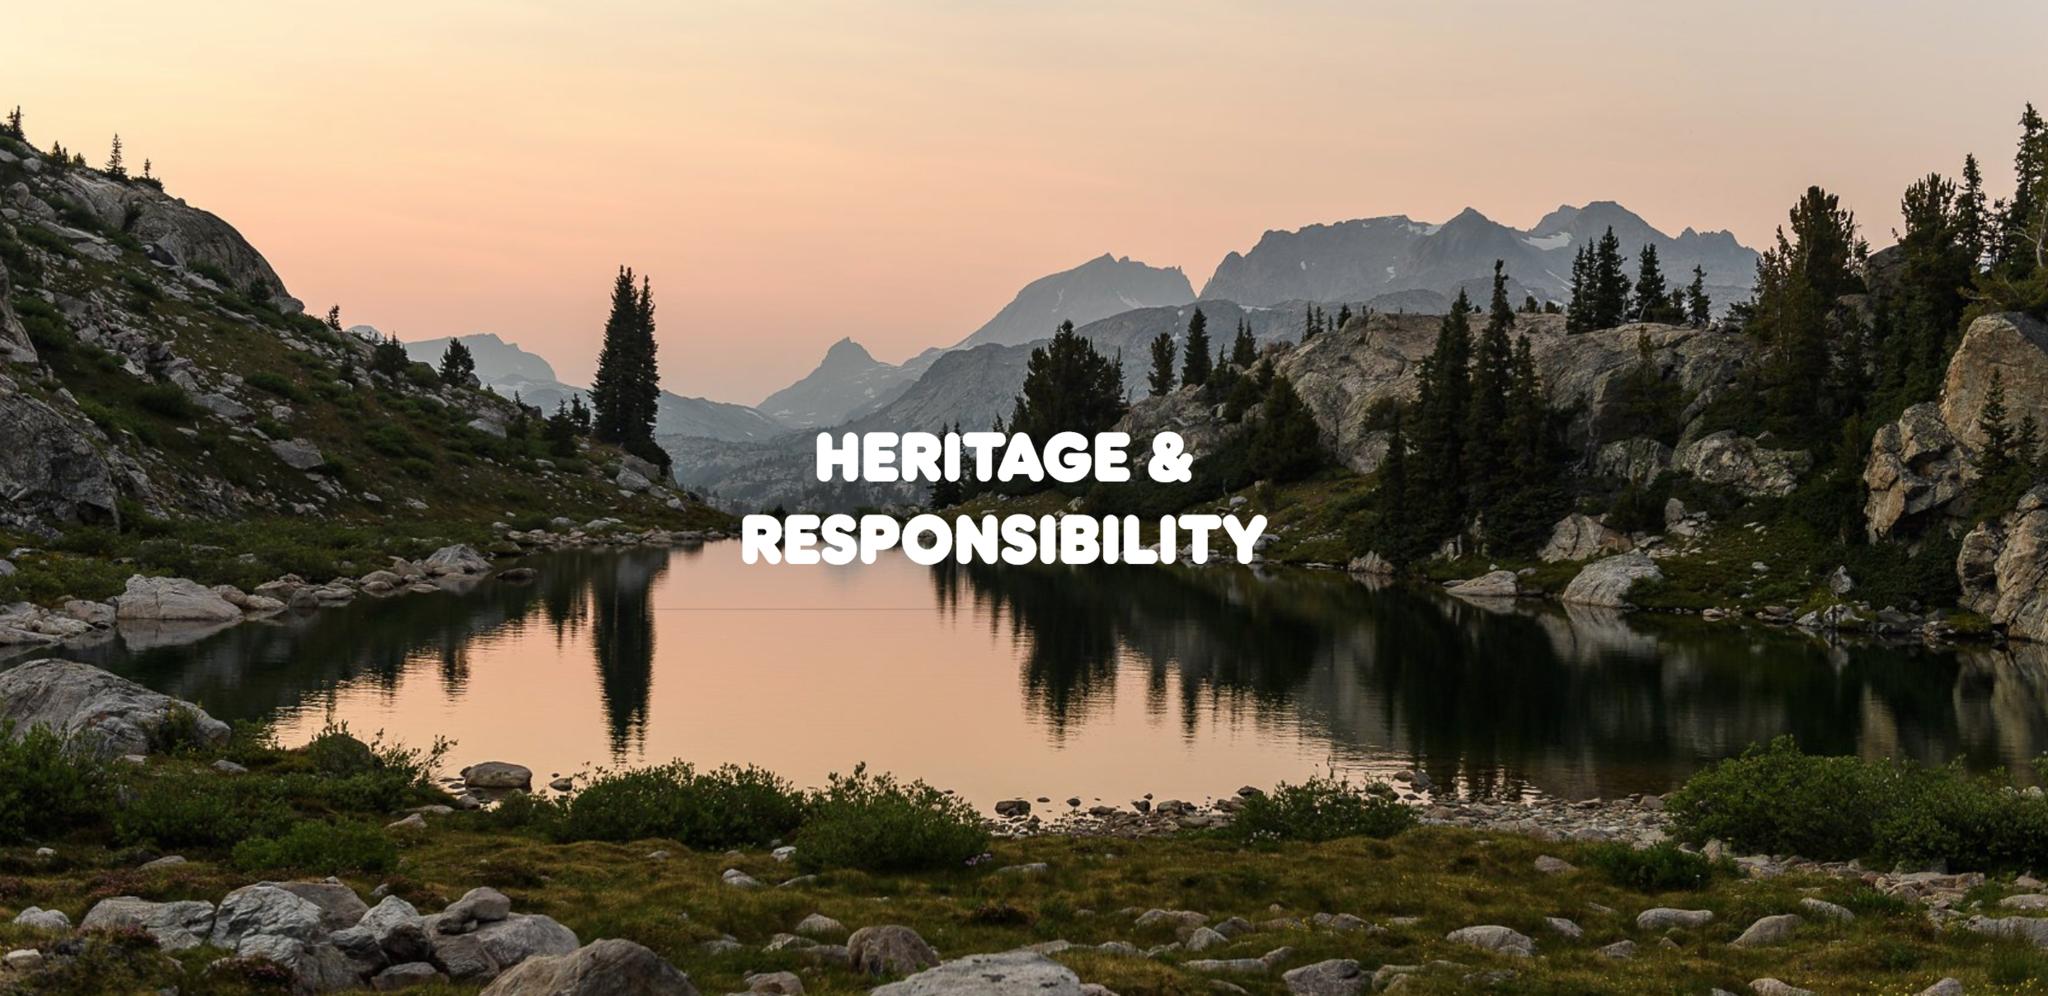 fjallraven Heritage Responsibility